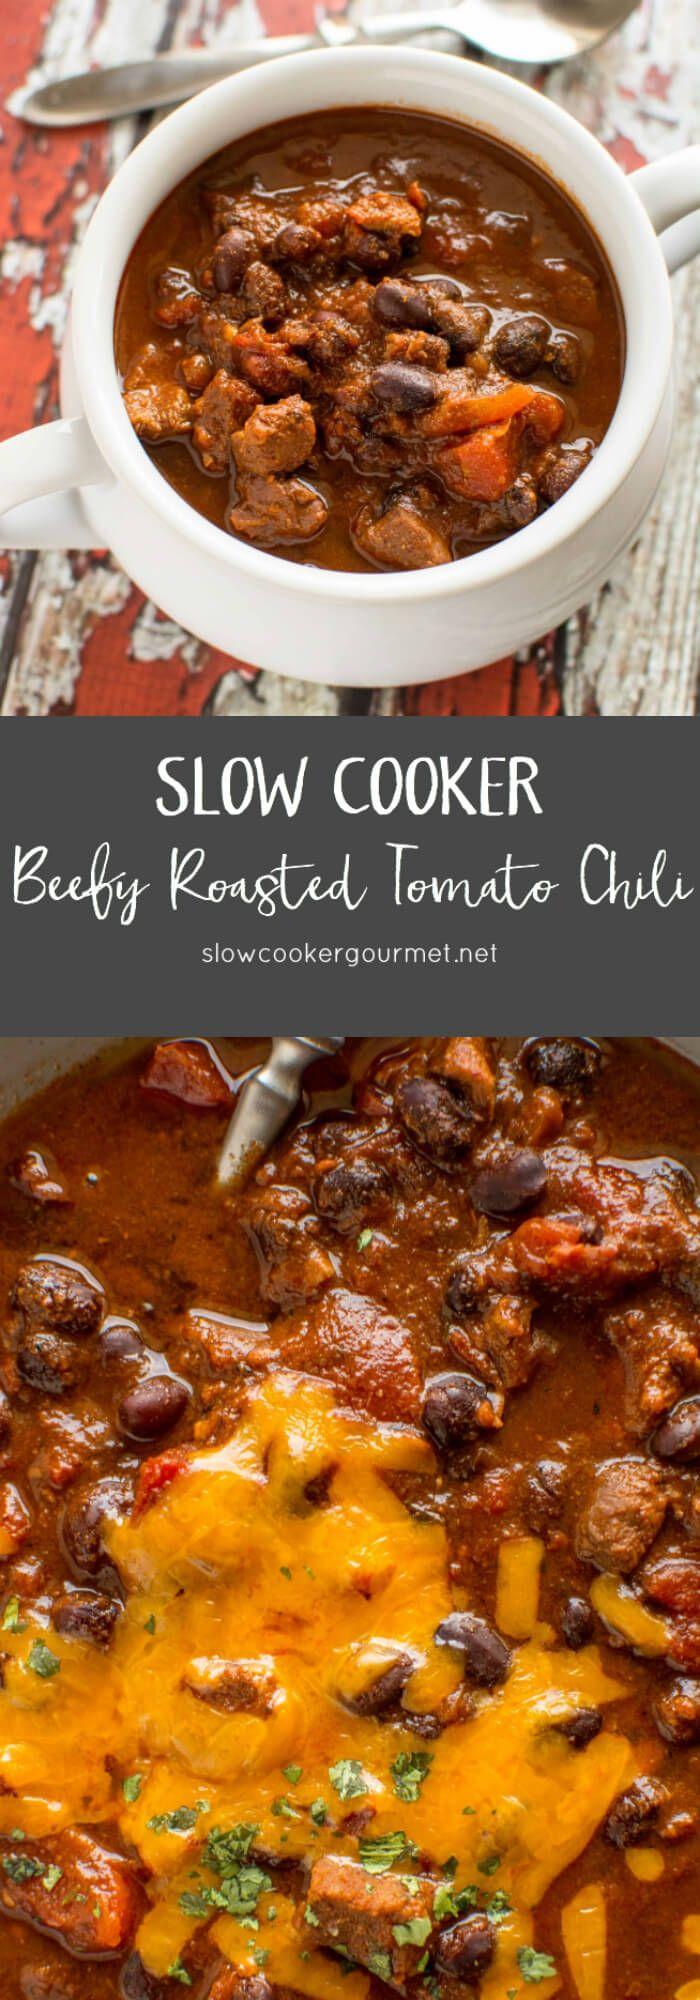 scg-beefy-roasted-tomato-chili-longpin                                                                                                                                                                                 More